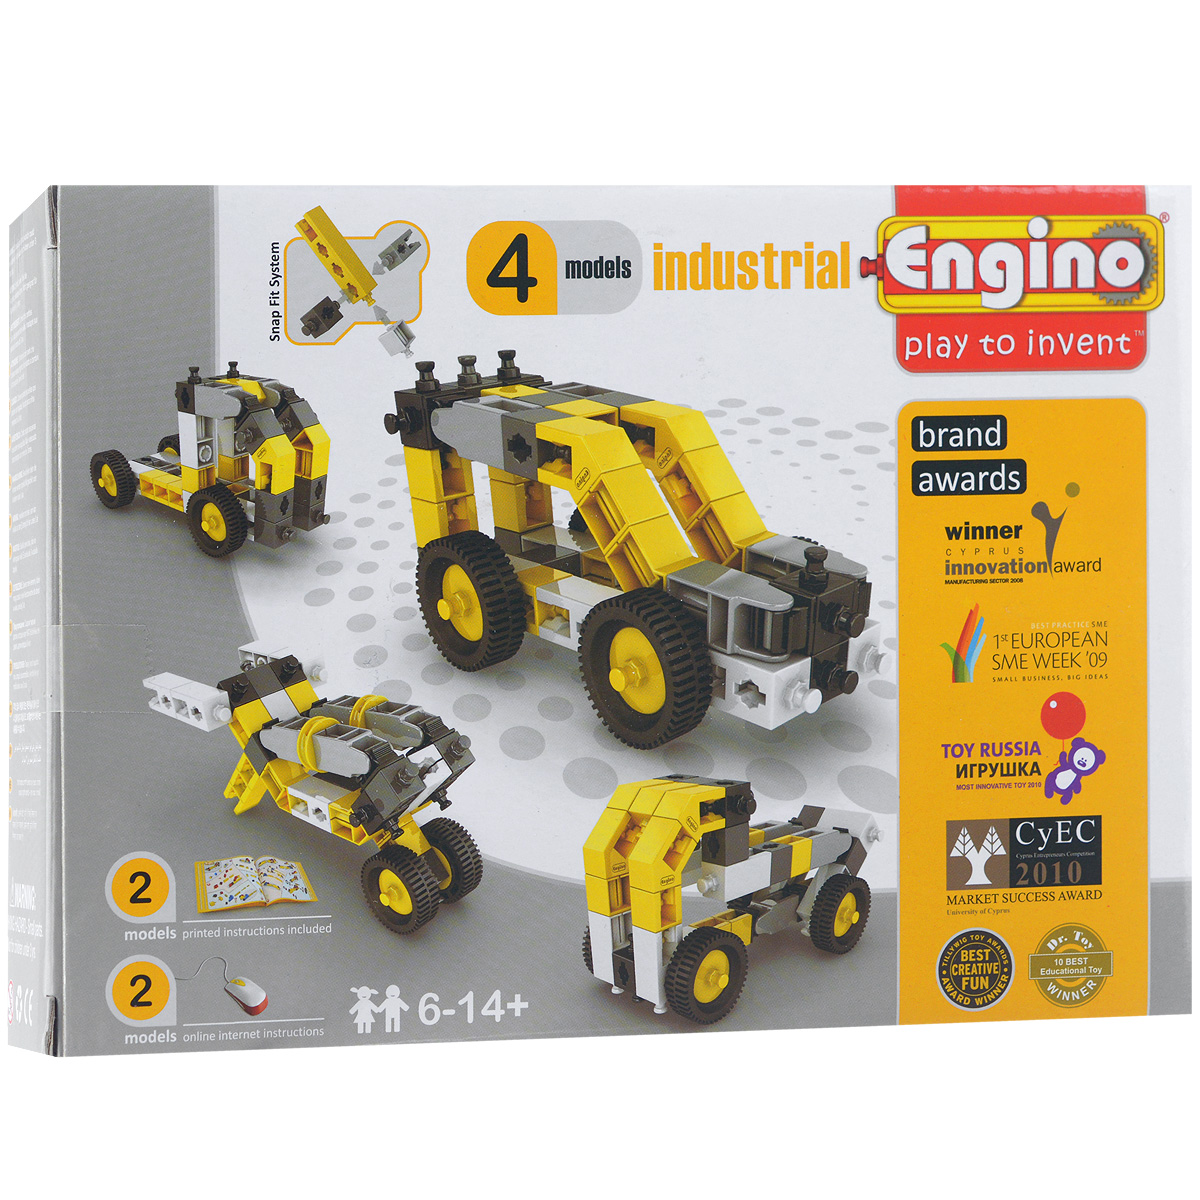 Engino Конструктор Engino Industrial 4 models